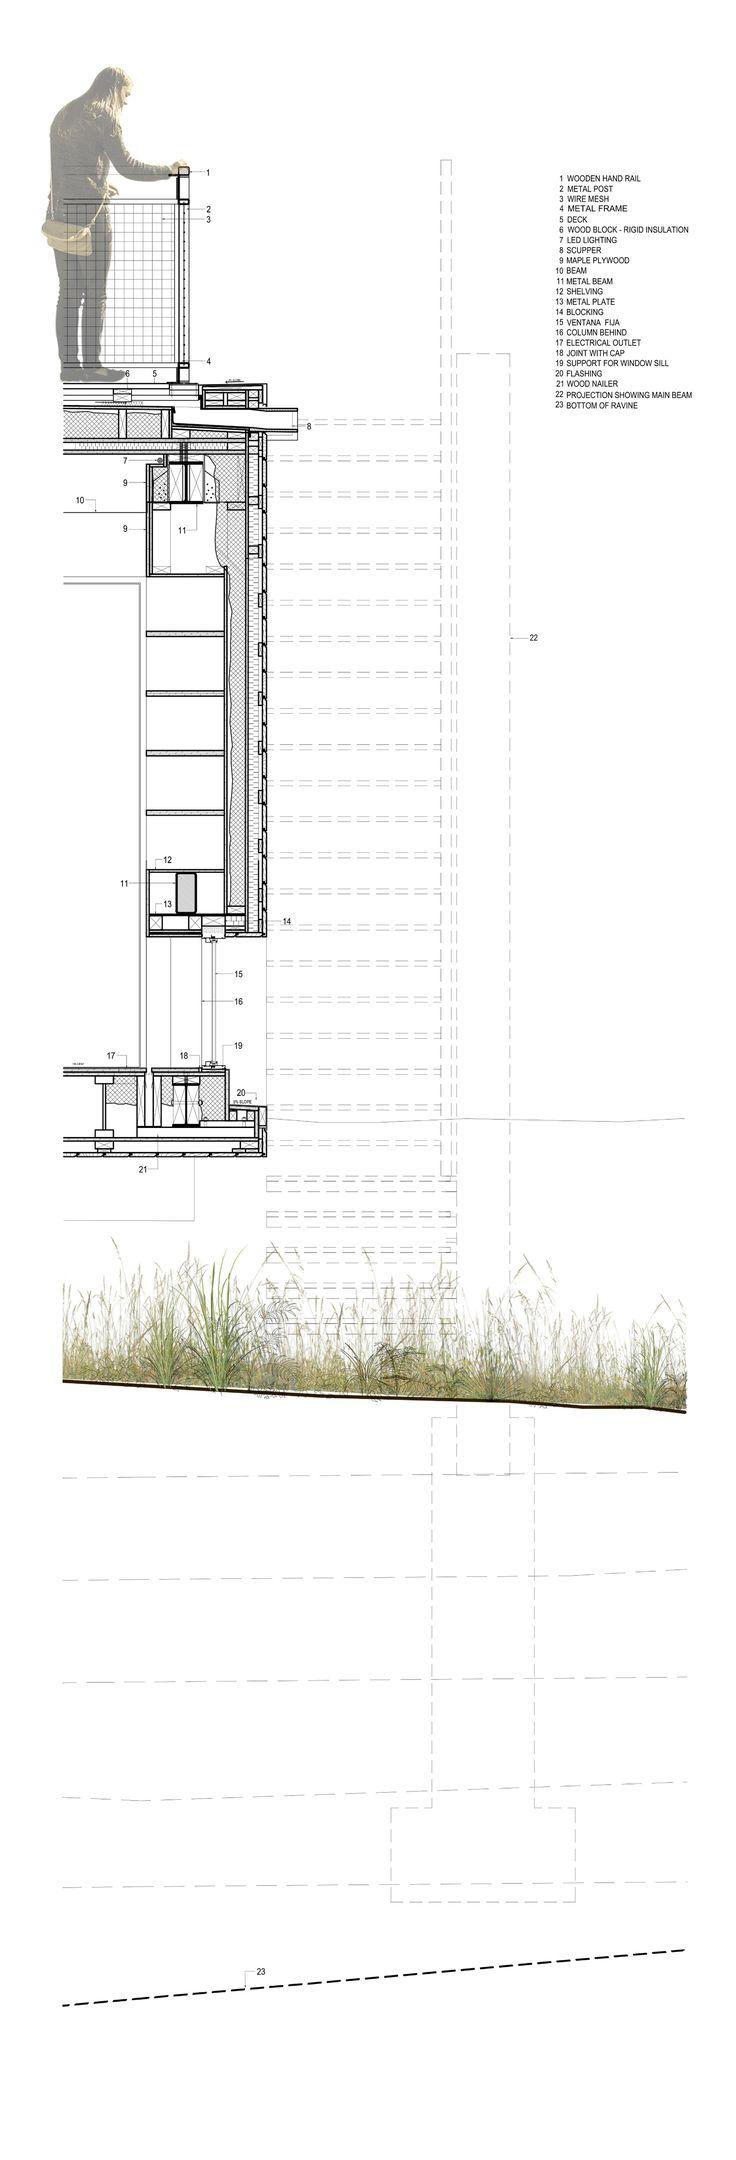 Image 32 of 32 from gallery of Bridge House / LLAMA urban design. Detail